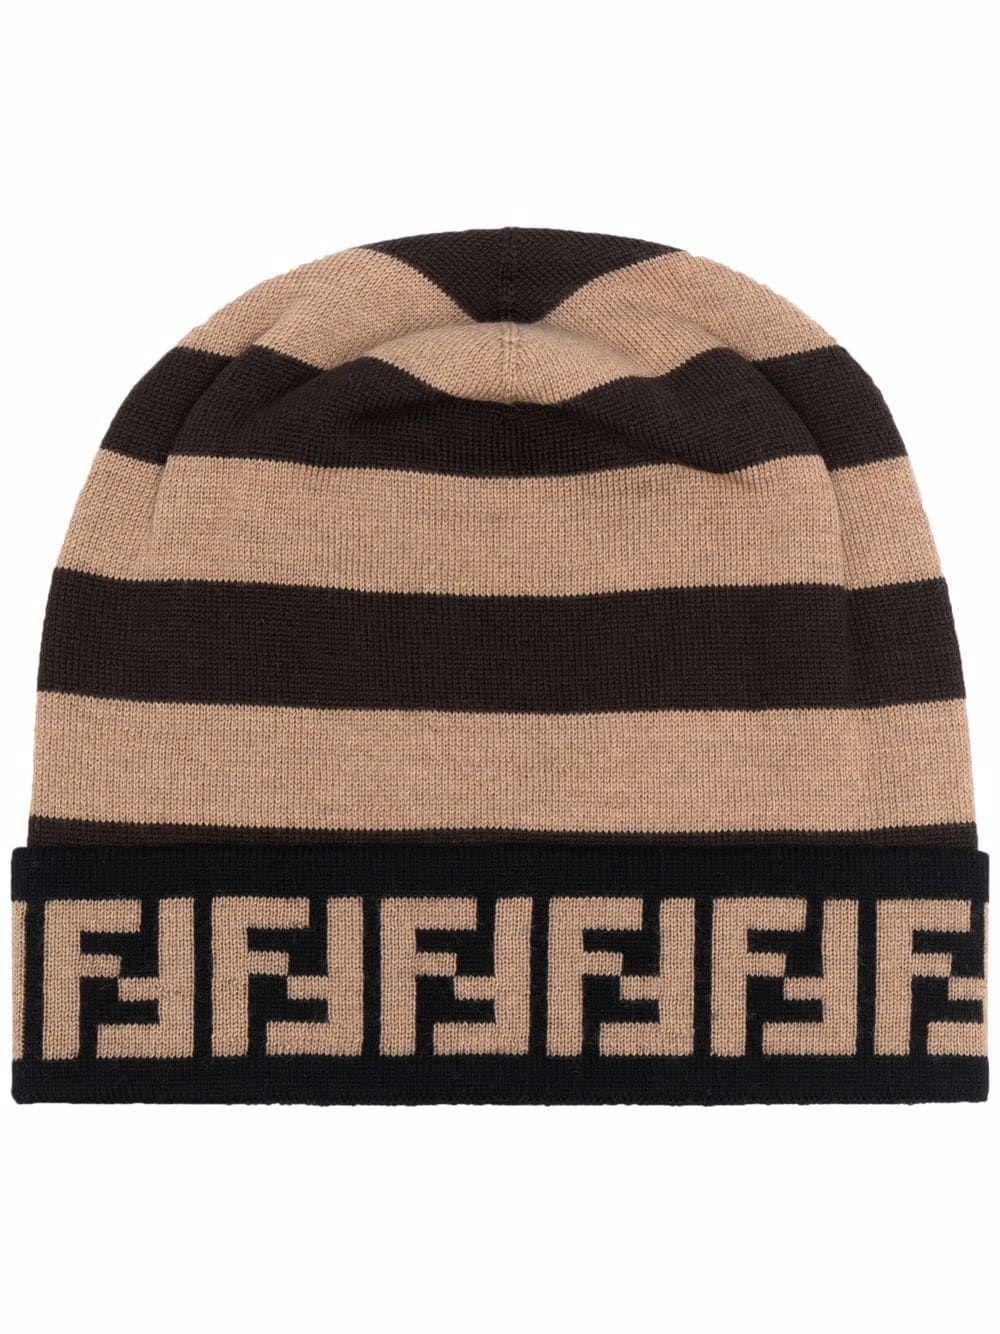 Fendi cappelli marrone - Fendi